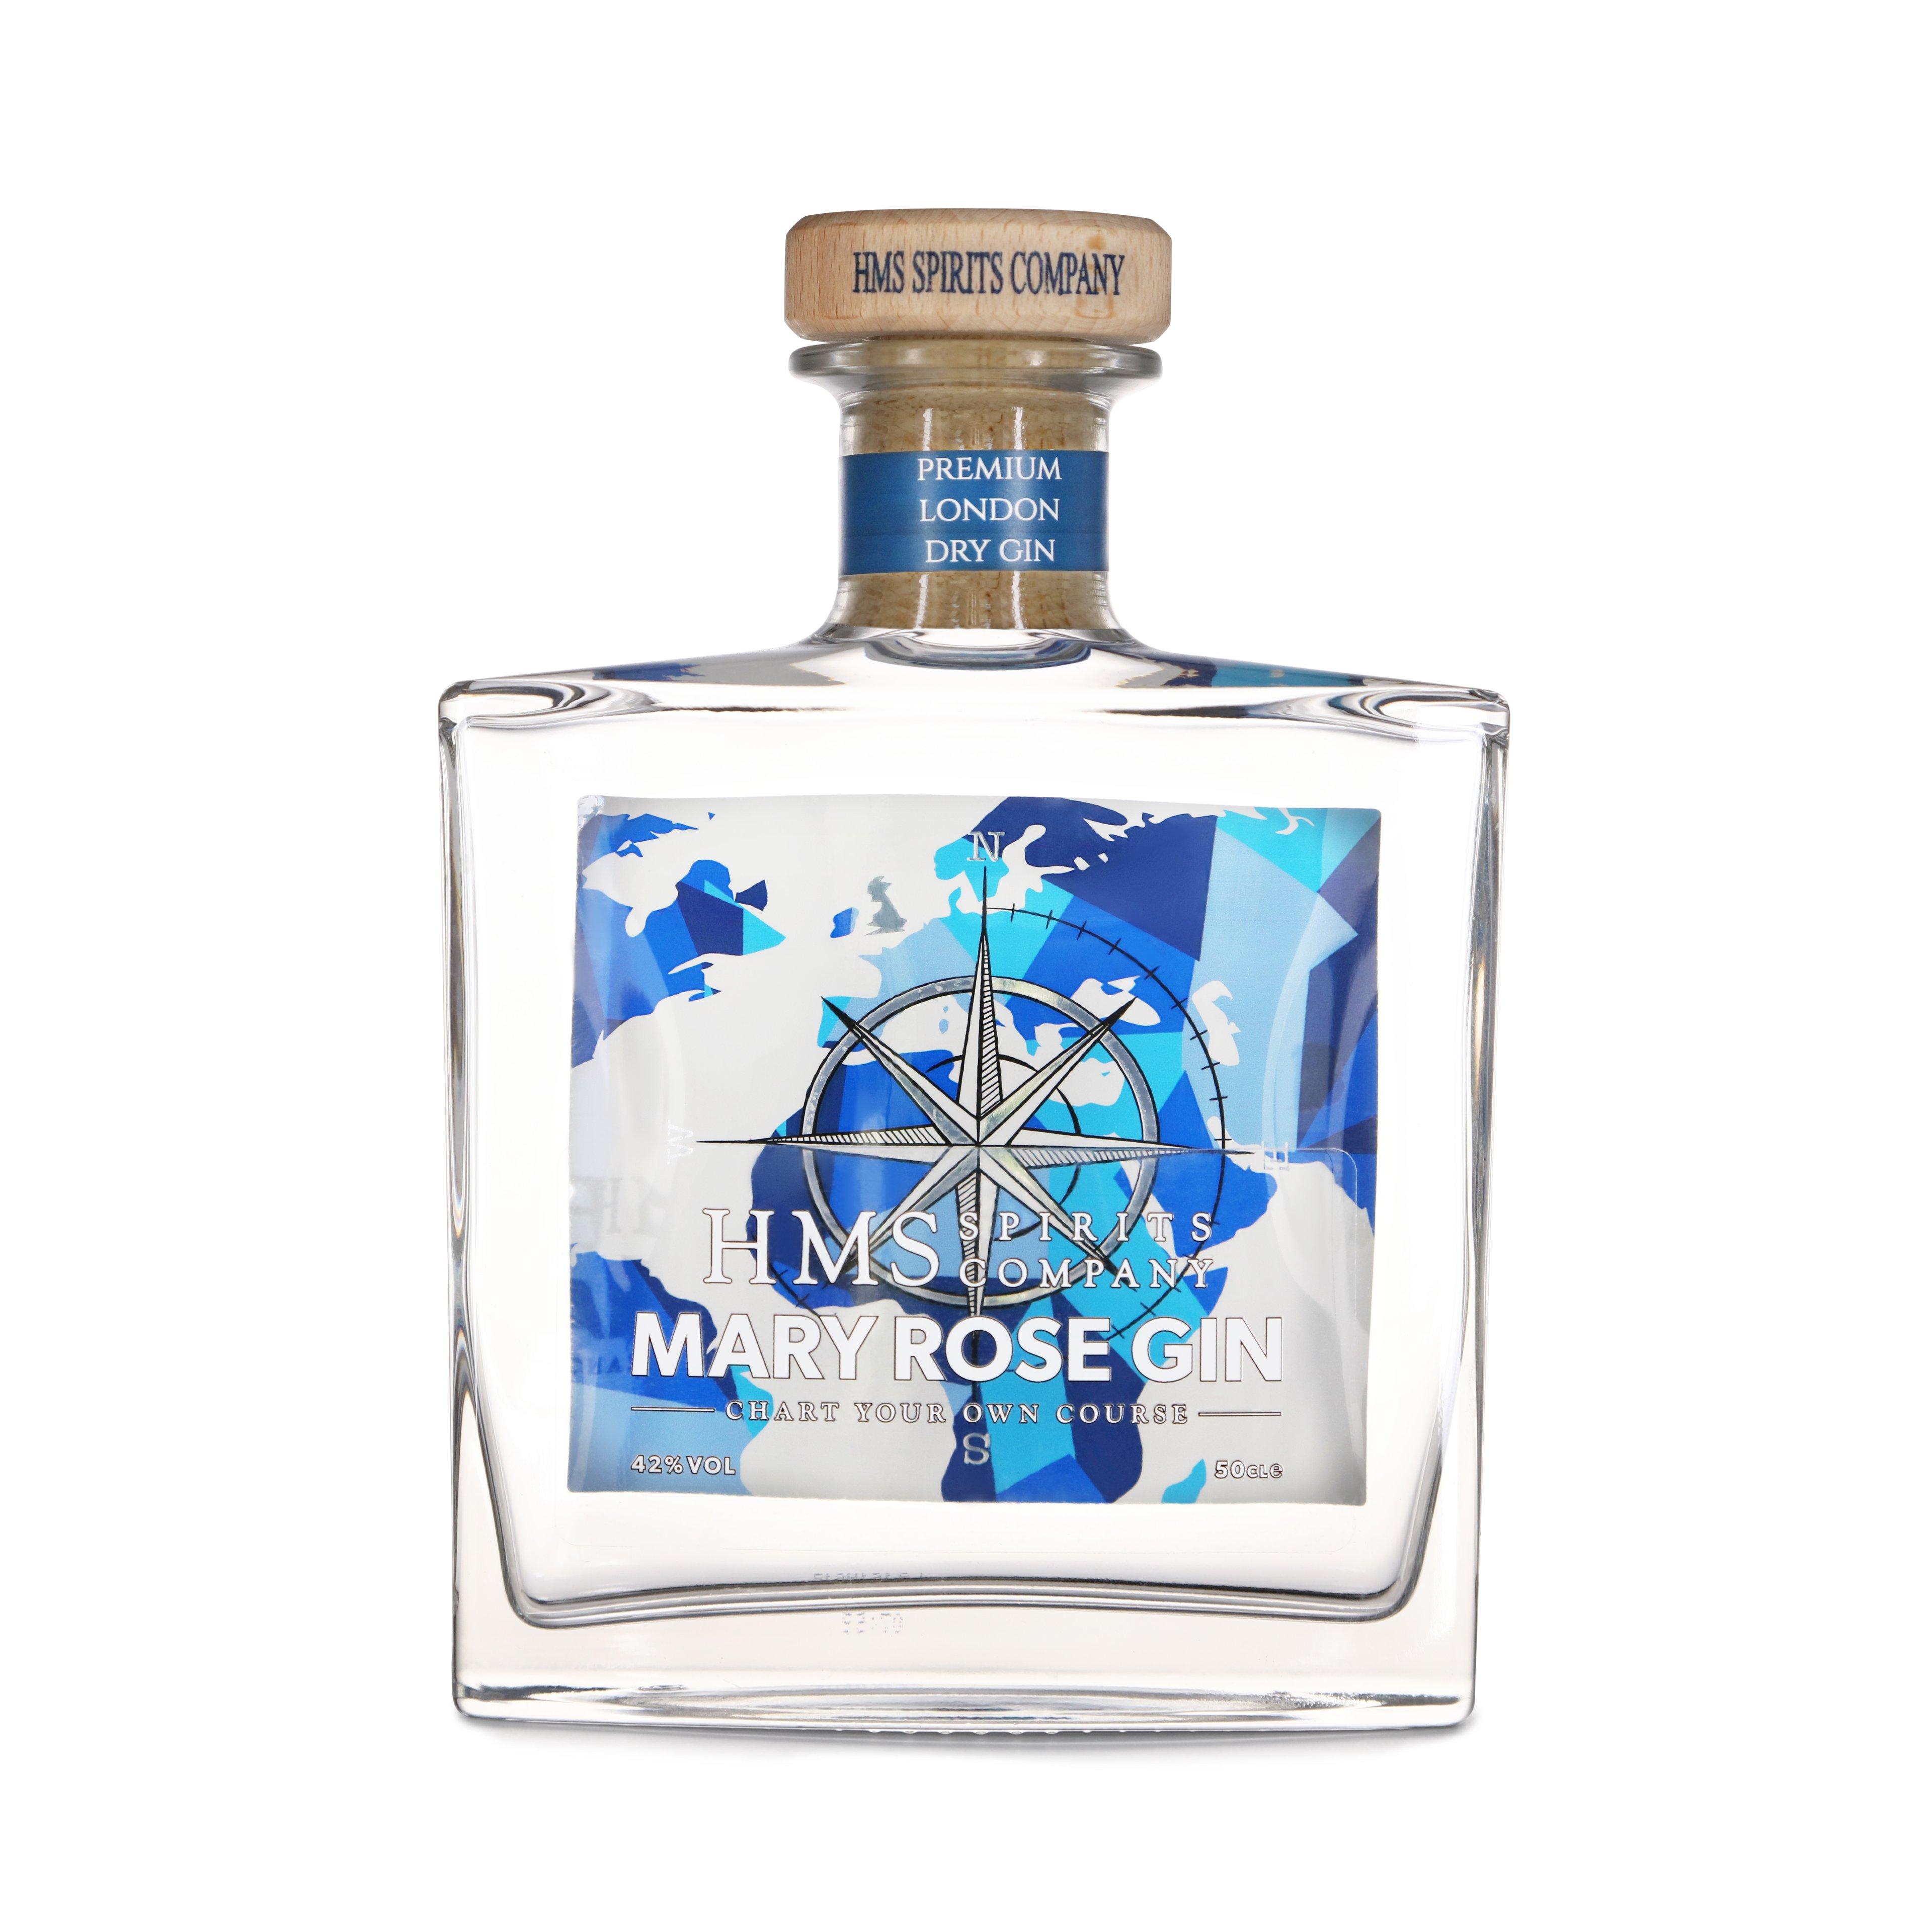 HMS Spirits Mary Rose Gin 50ml